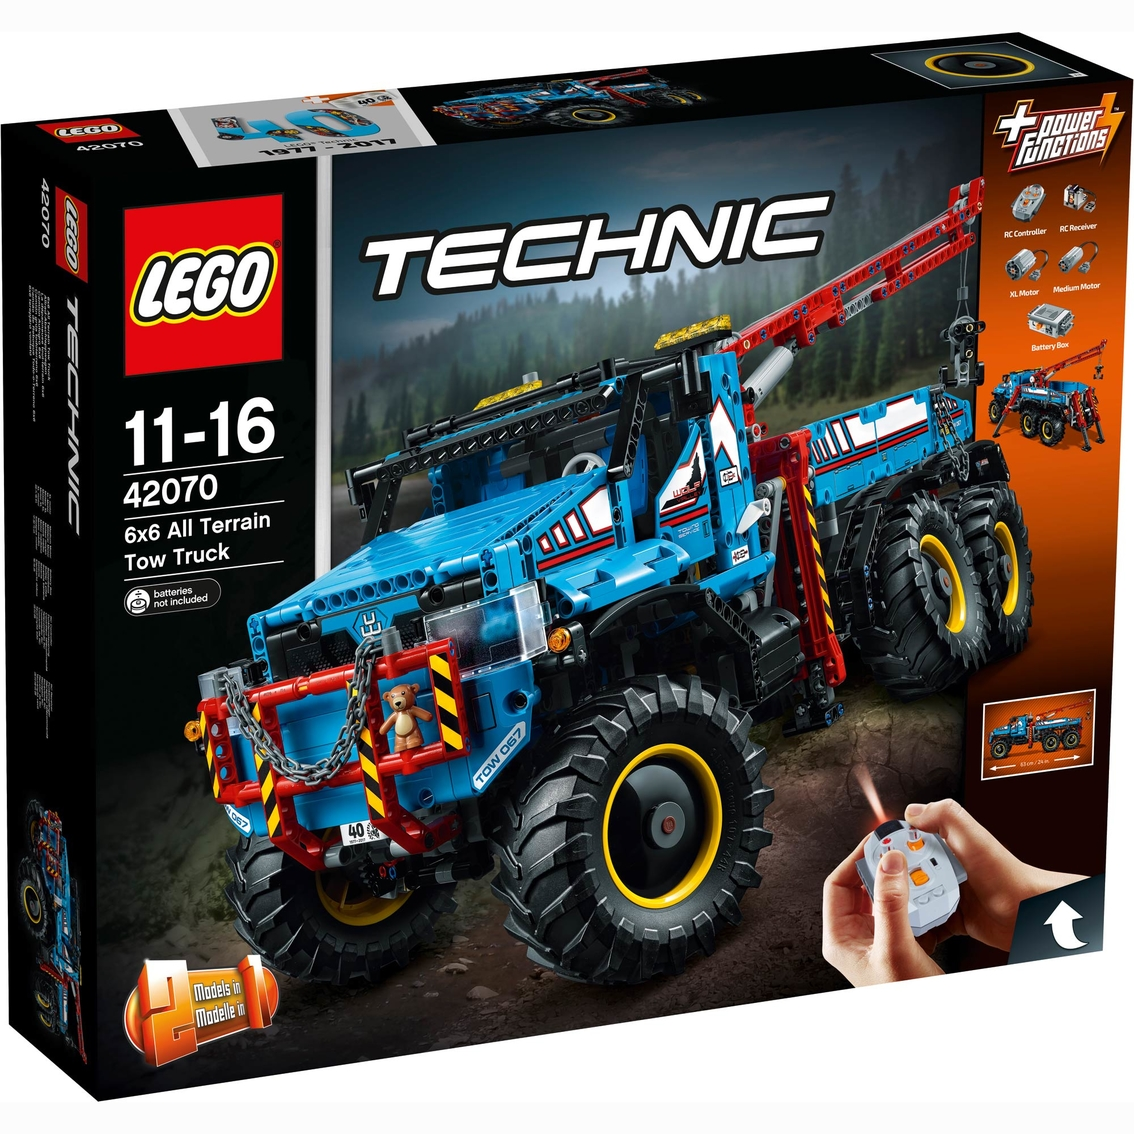 Lego technic modelle 2020